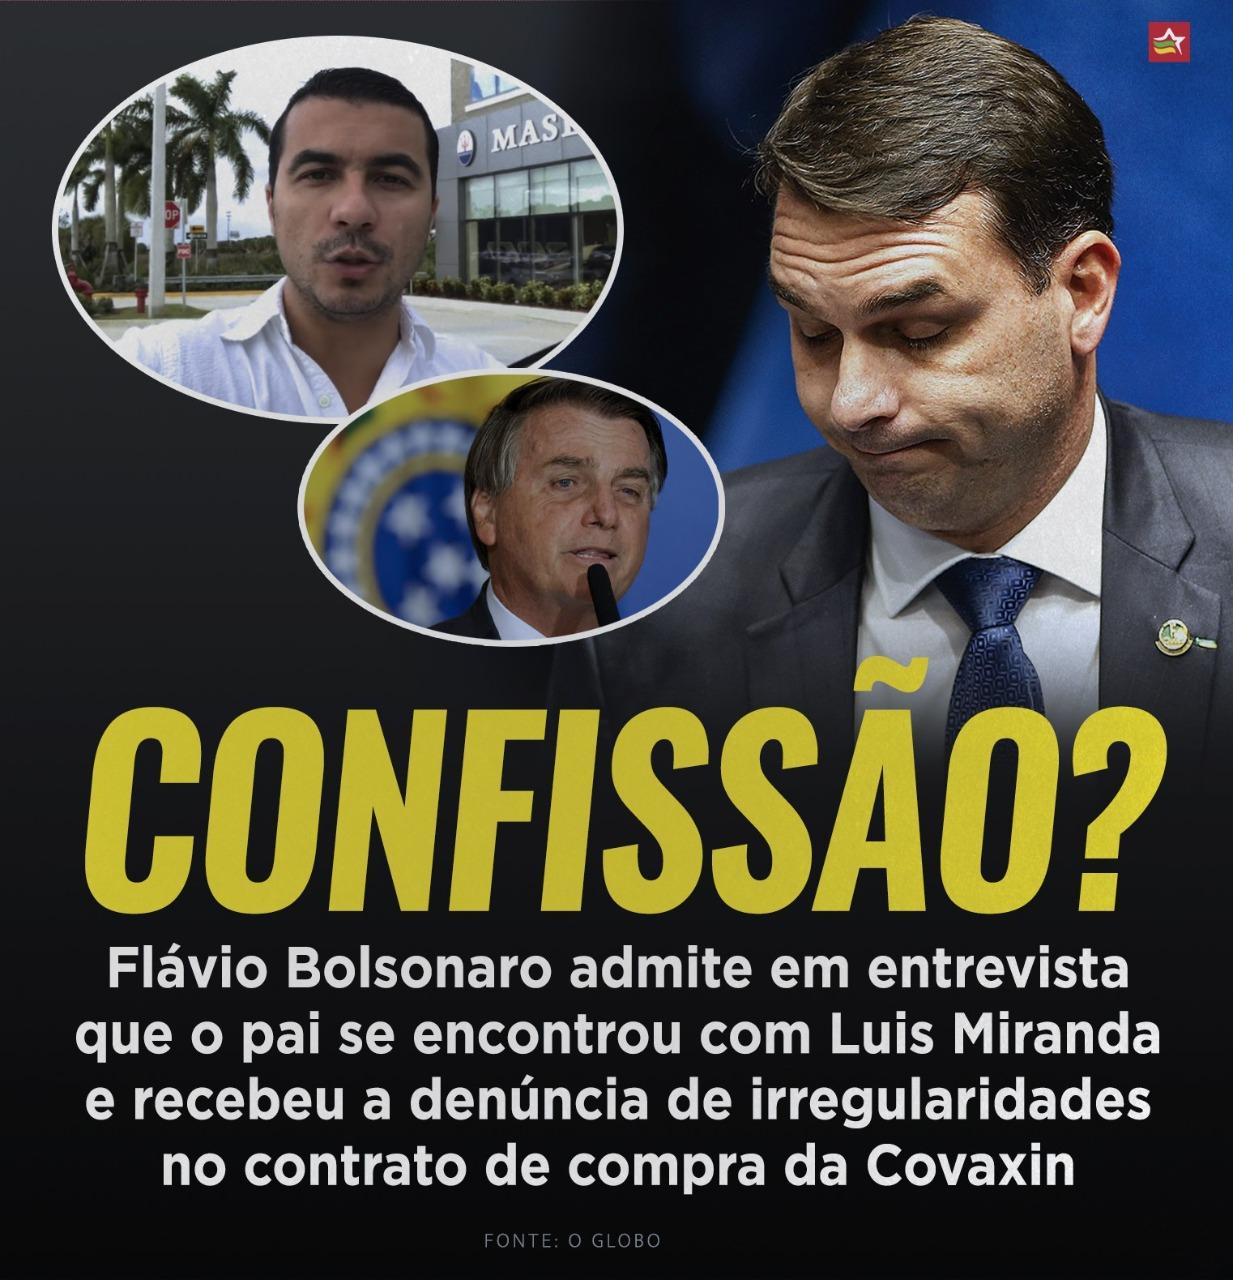 flavio_bolsonaro_confissao